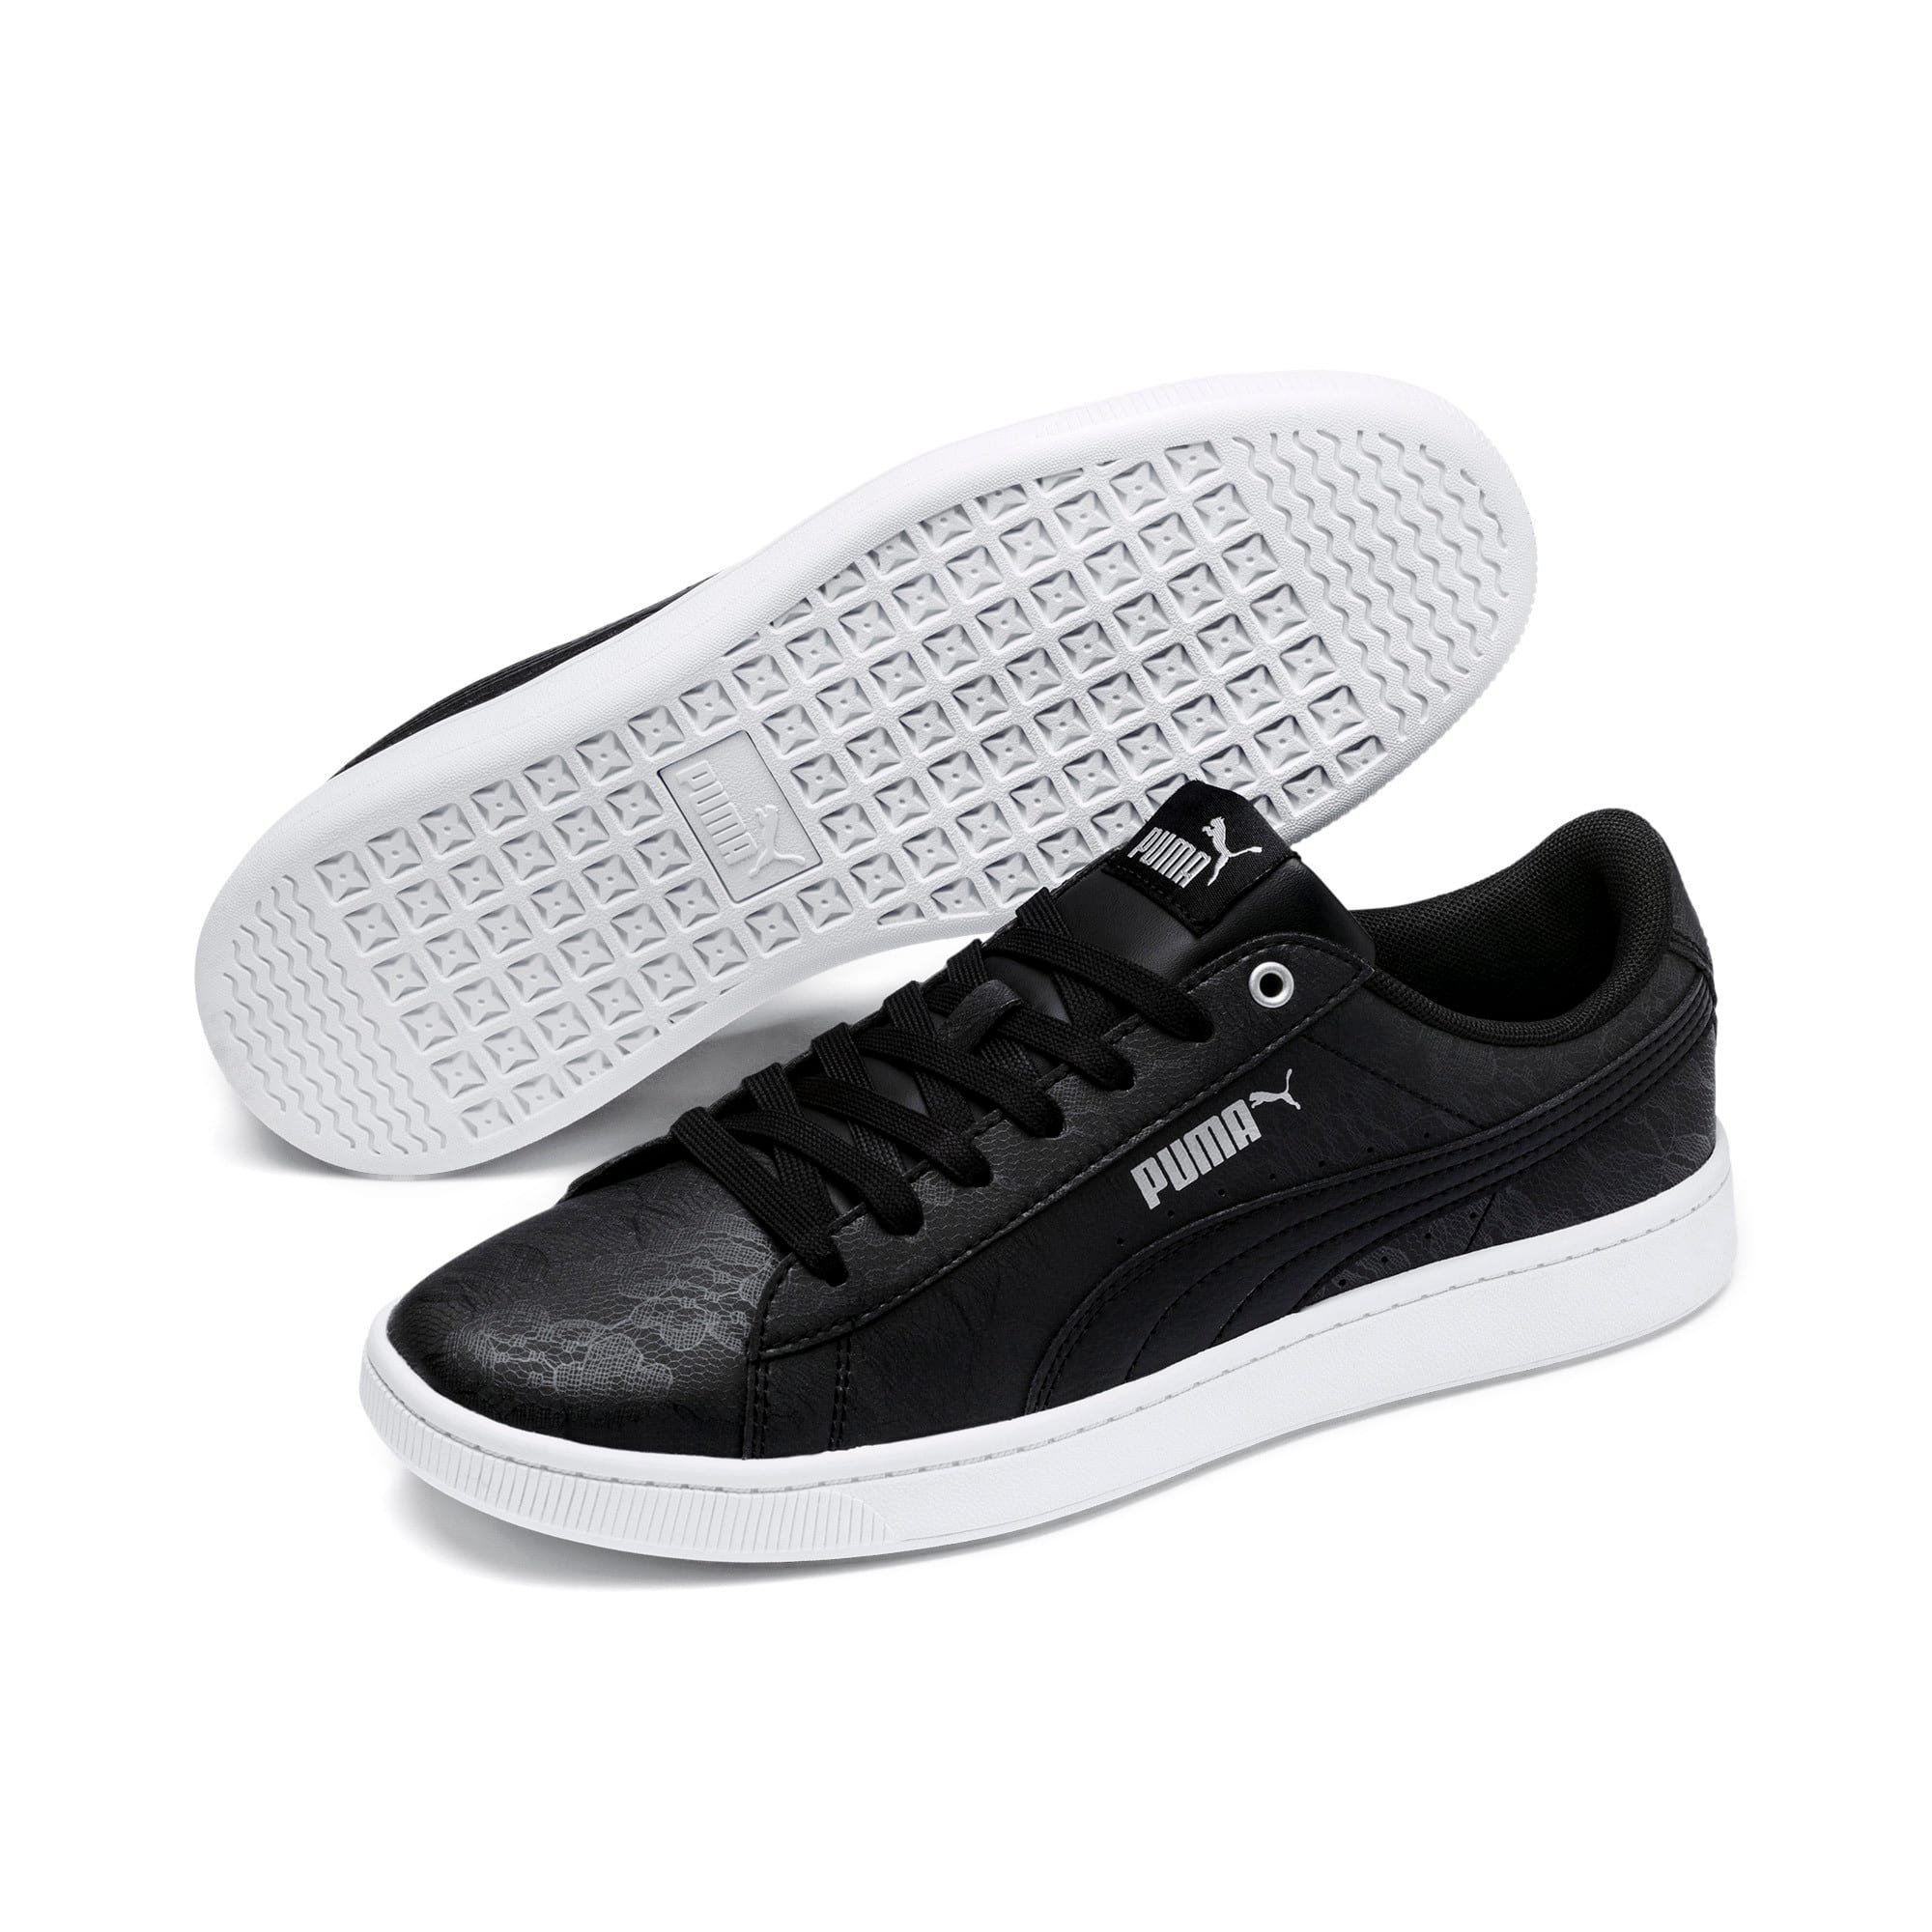 Thumbnail 2 of PUMA Vikky v2 Summer Women's Sneakers, Puma Black-Silver-Puma White, medium